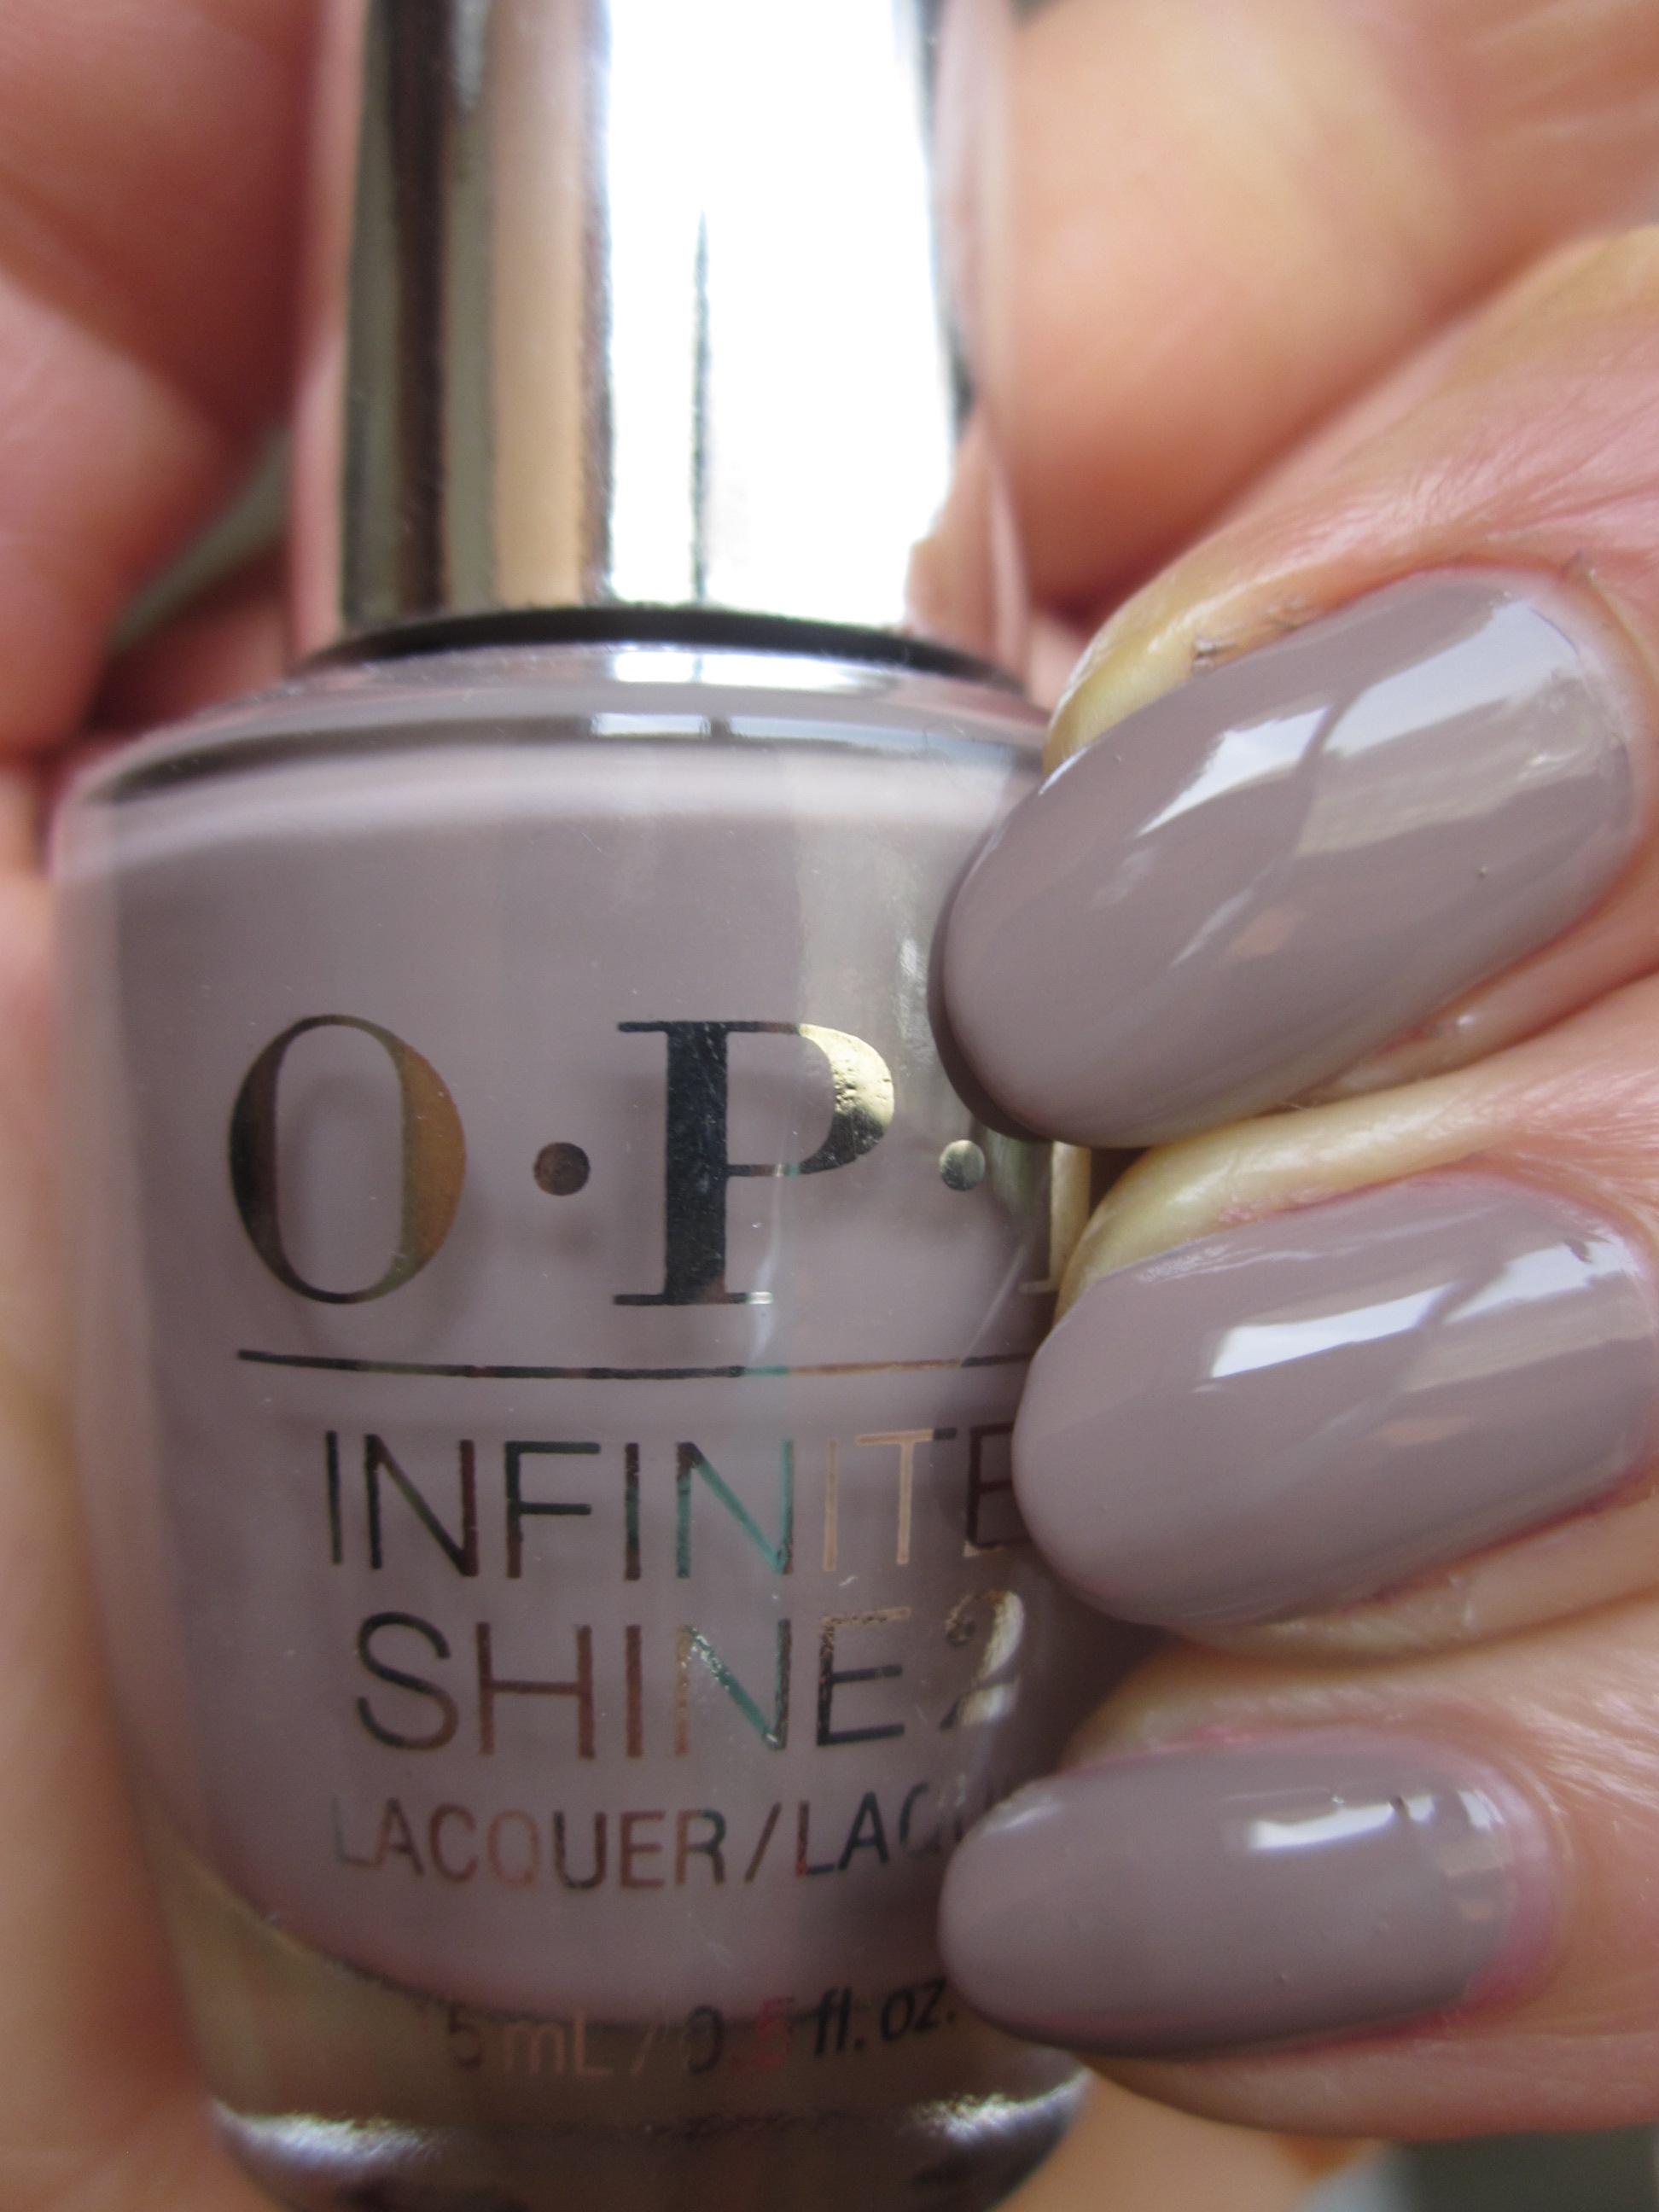 OPI INFINITE SHINE(インフィニット シャイン)  IS-L28 Staying Neutral(スティング ニュートラル)